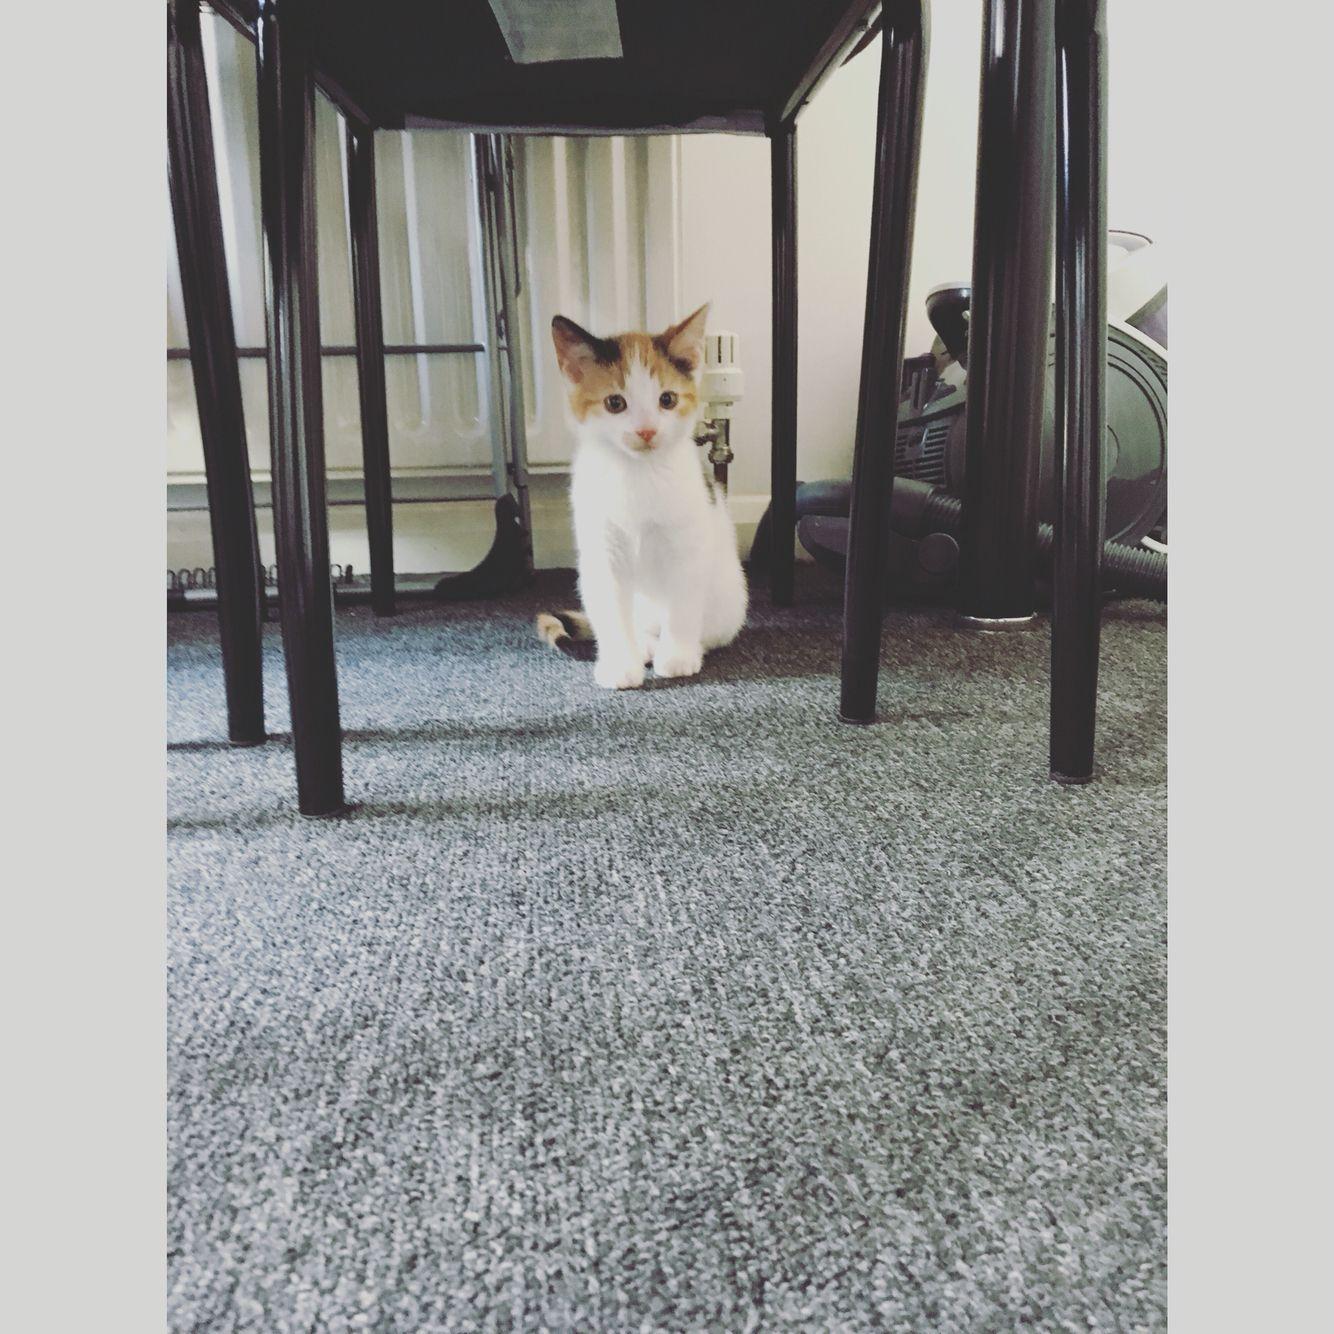 #kitten #juno #8 #weeks #baby #girl #love #pretty #white #black #ginger #kitchen #home #pet #eternal #love